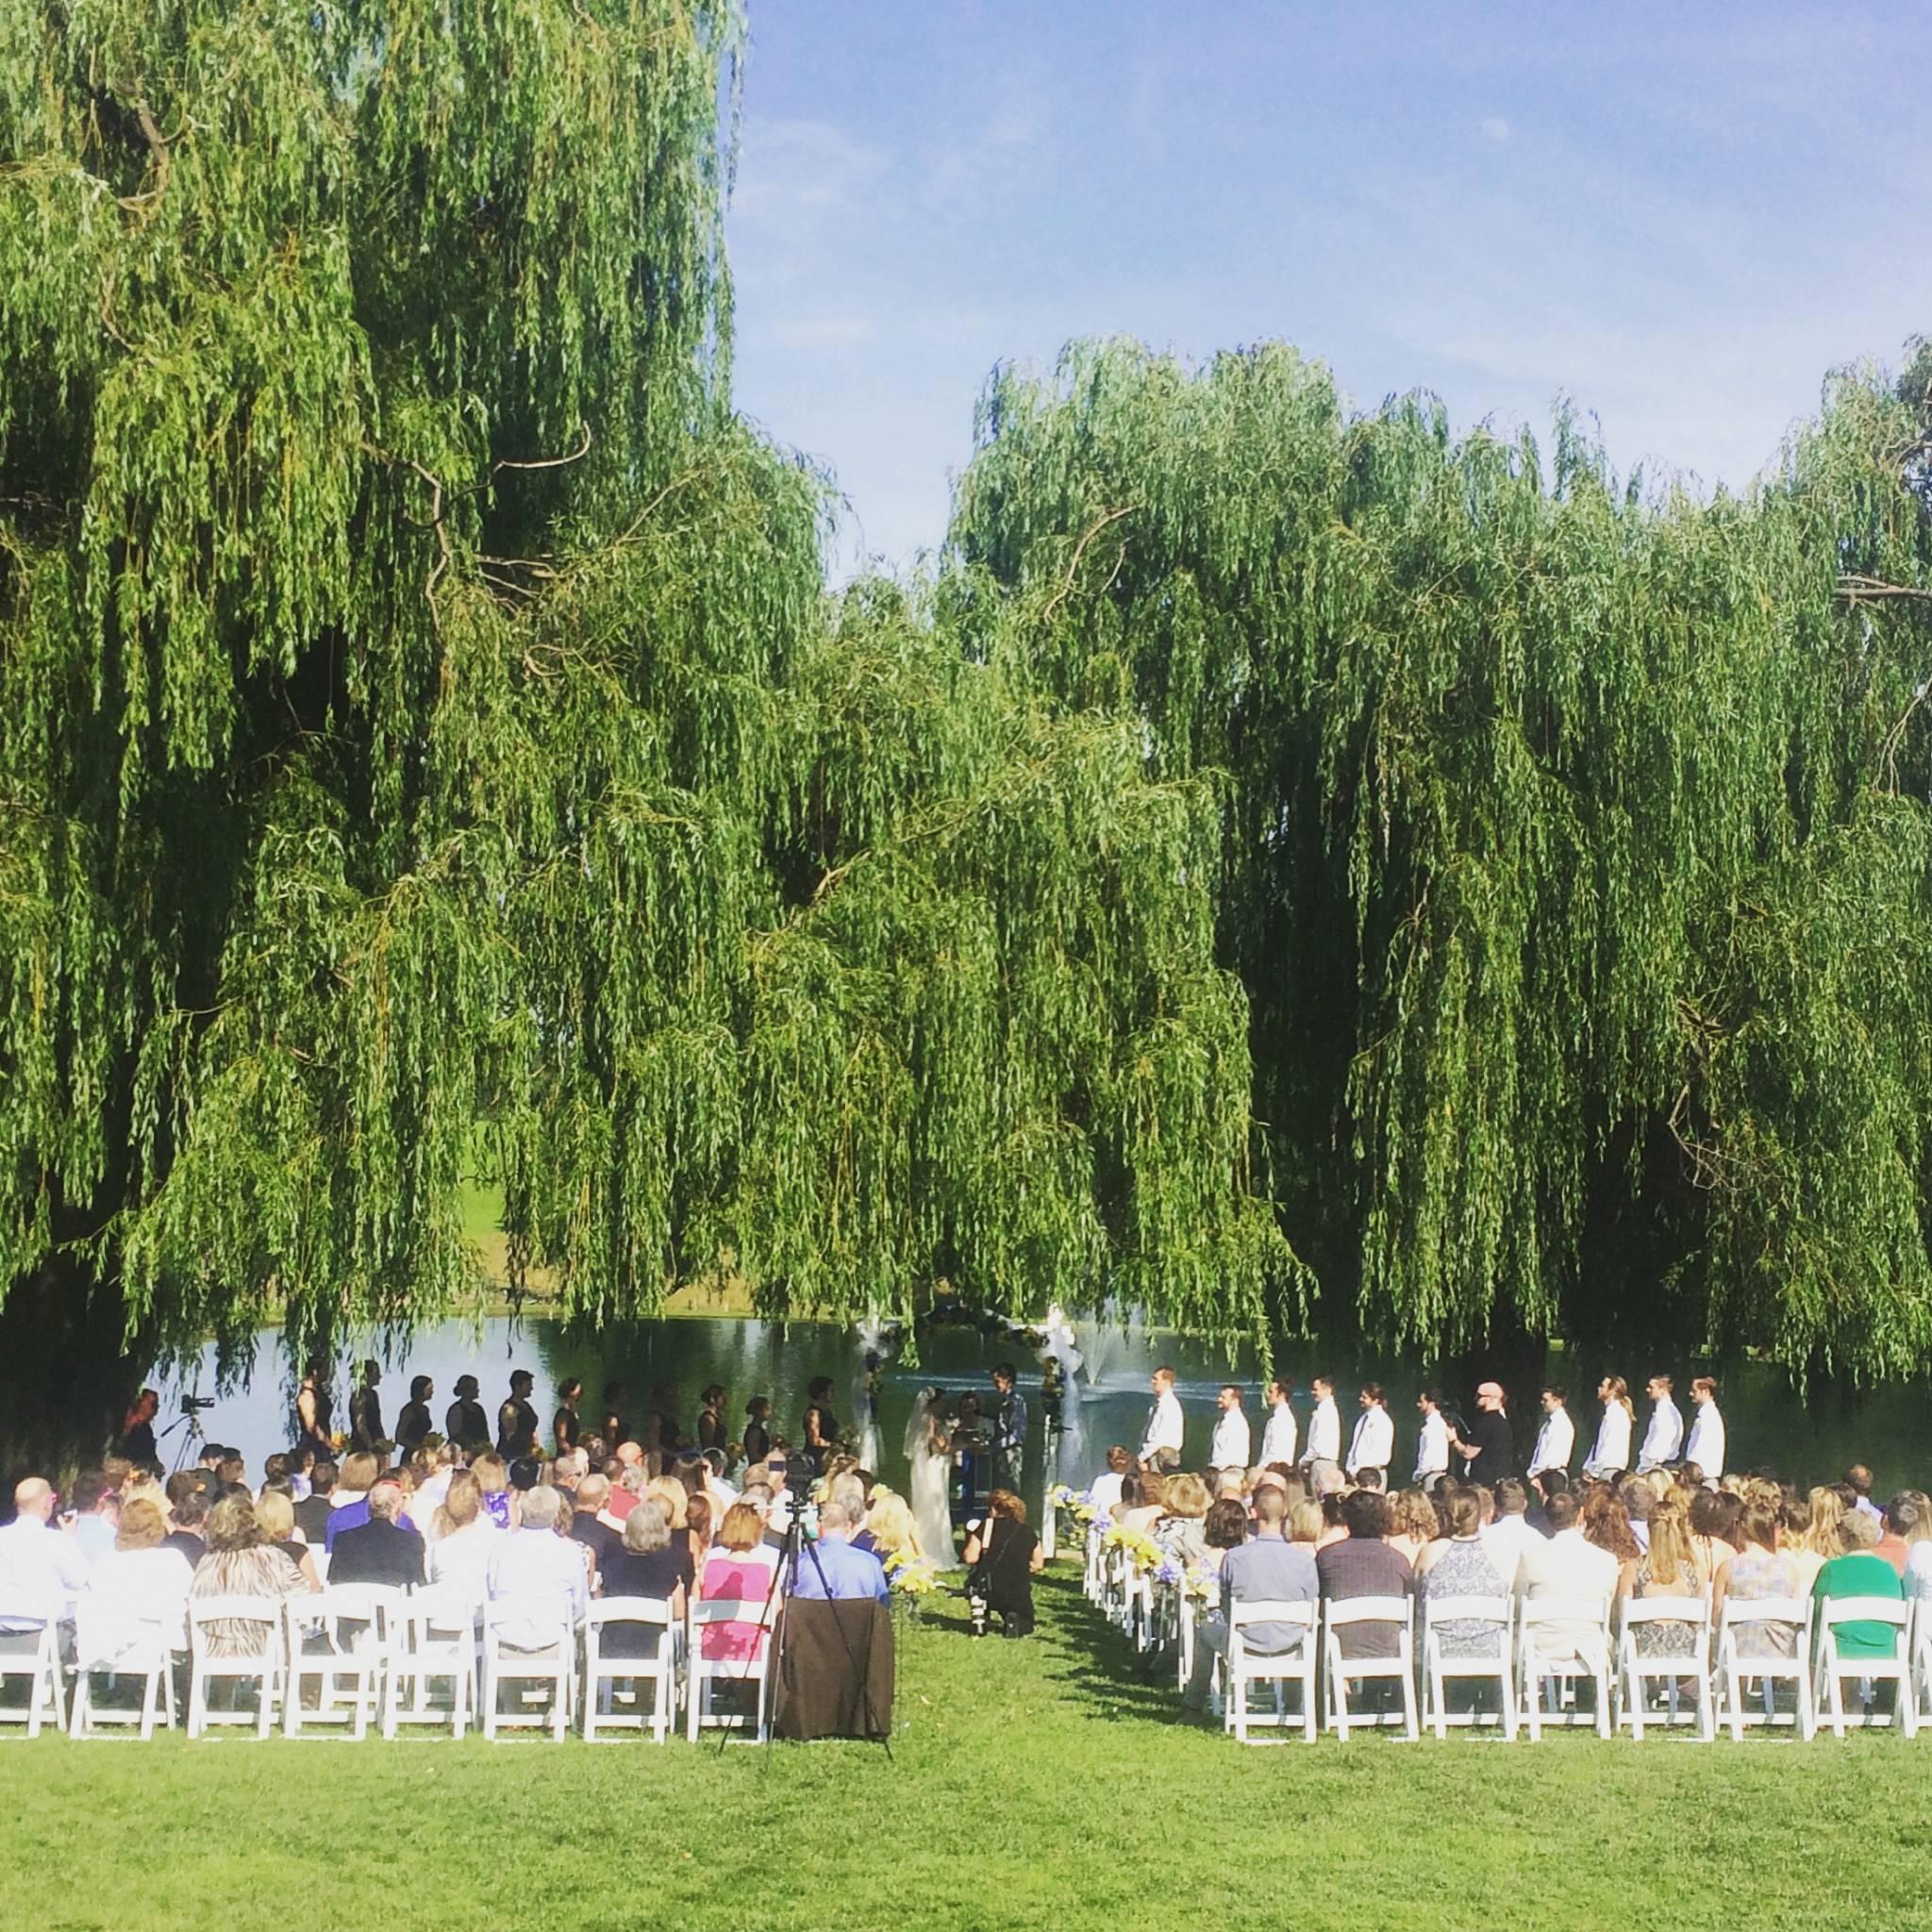 Megan Amp Kyles Wedding Reception At Pond View Farm